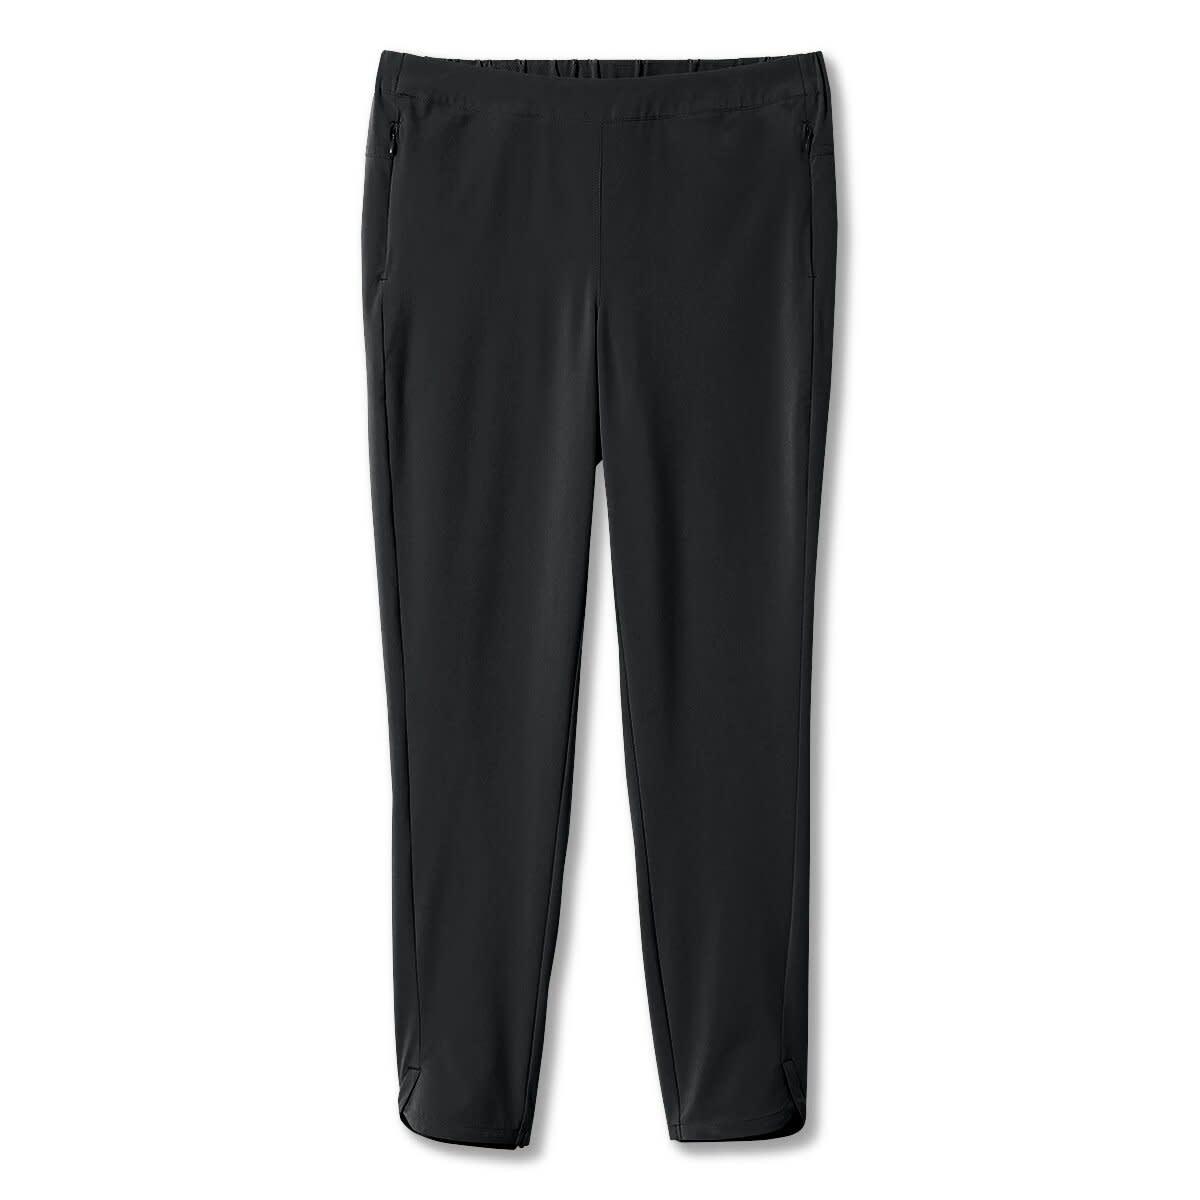 Royal Robbins Spotless Traveler Pant - Black